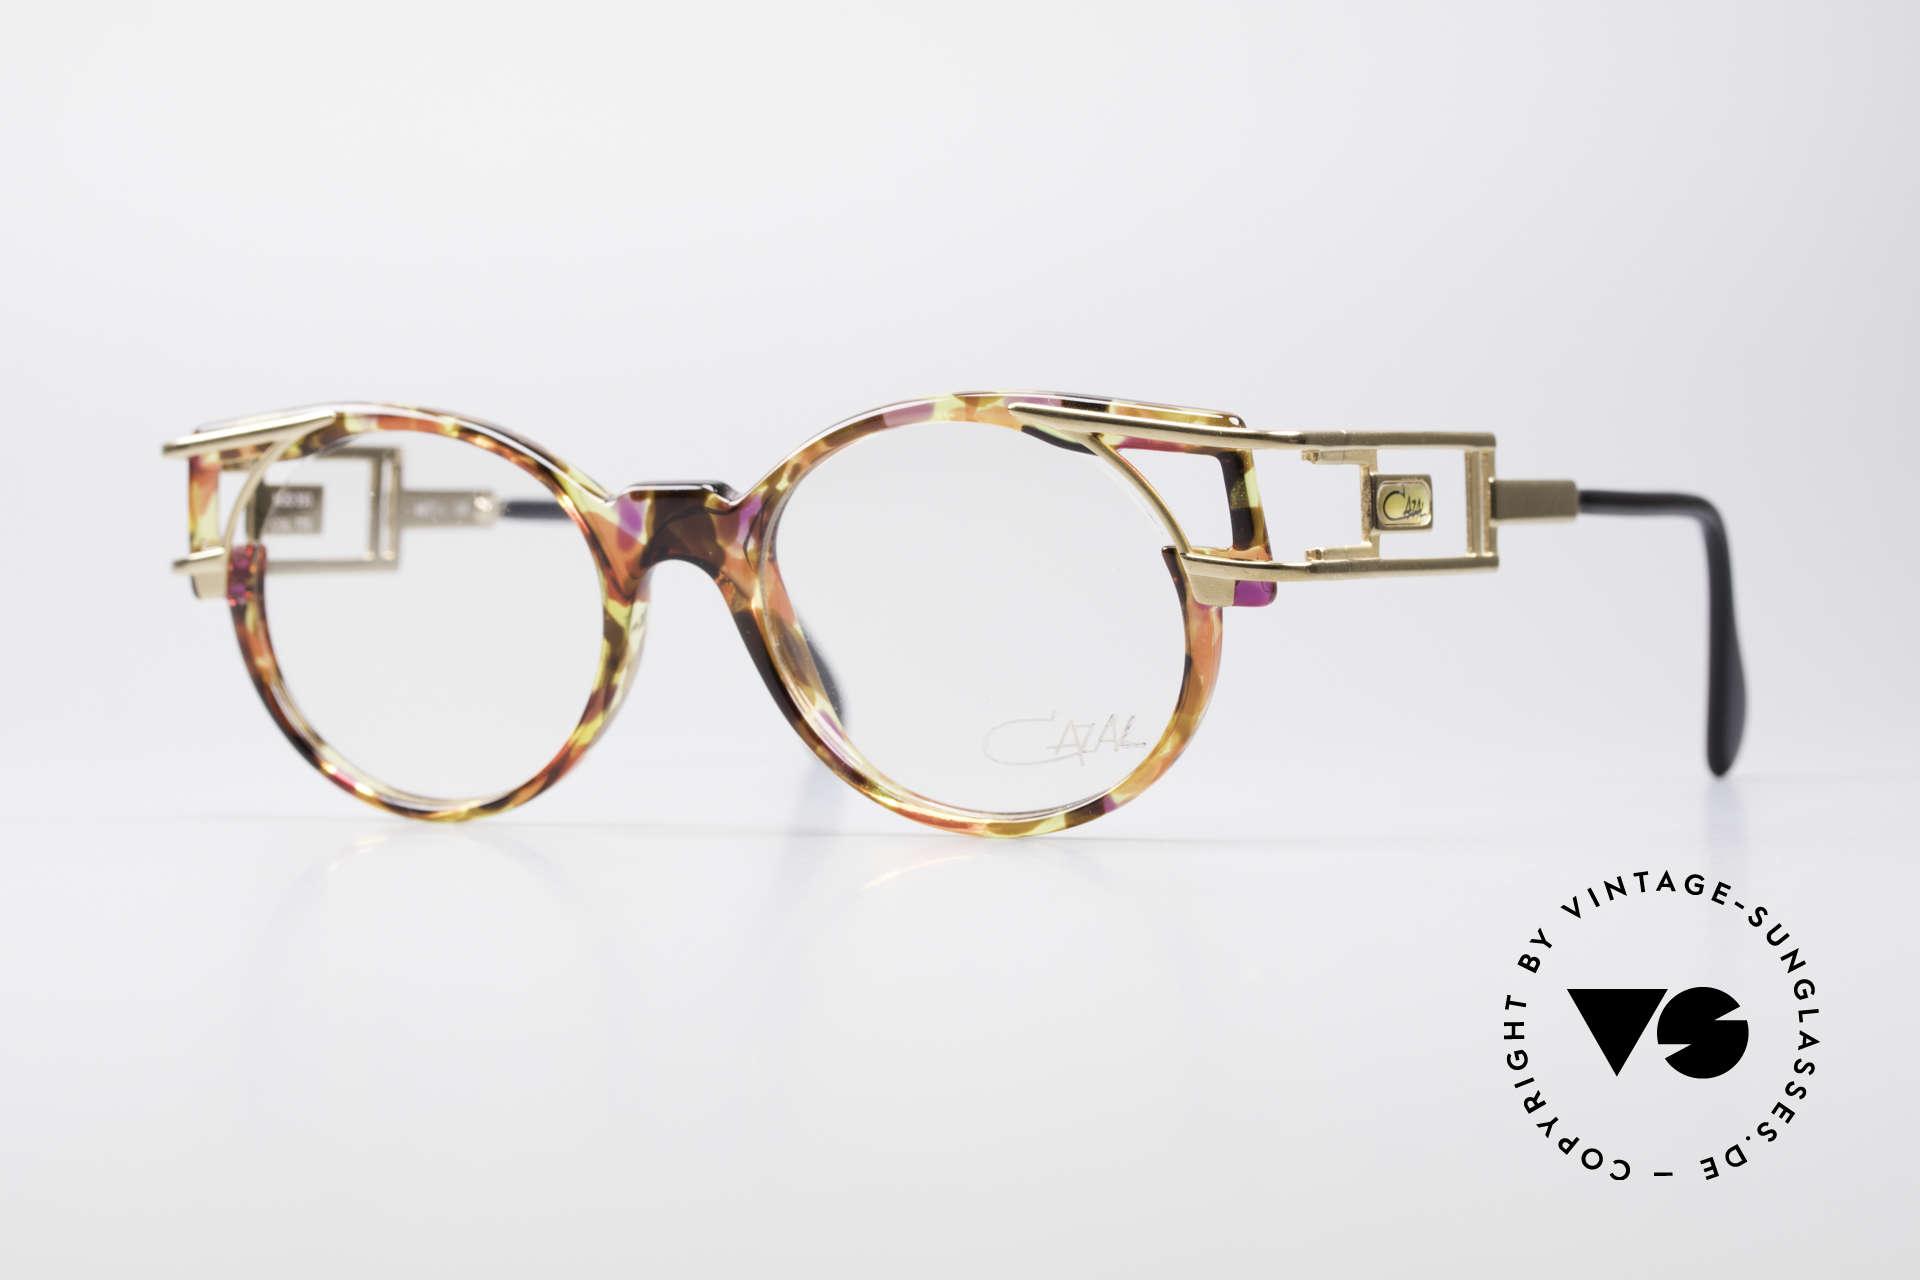 Cazal 353 Old School Hip Hop Eyeglasses, true vintage Cazal designer eyeglass-frame from 1991, Made for Men and Women